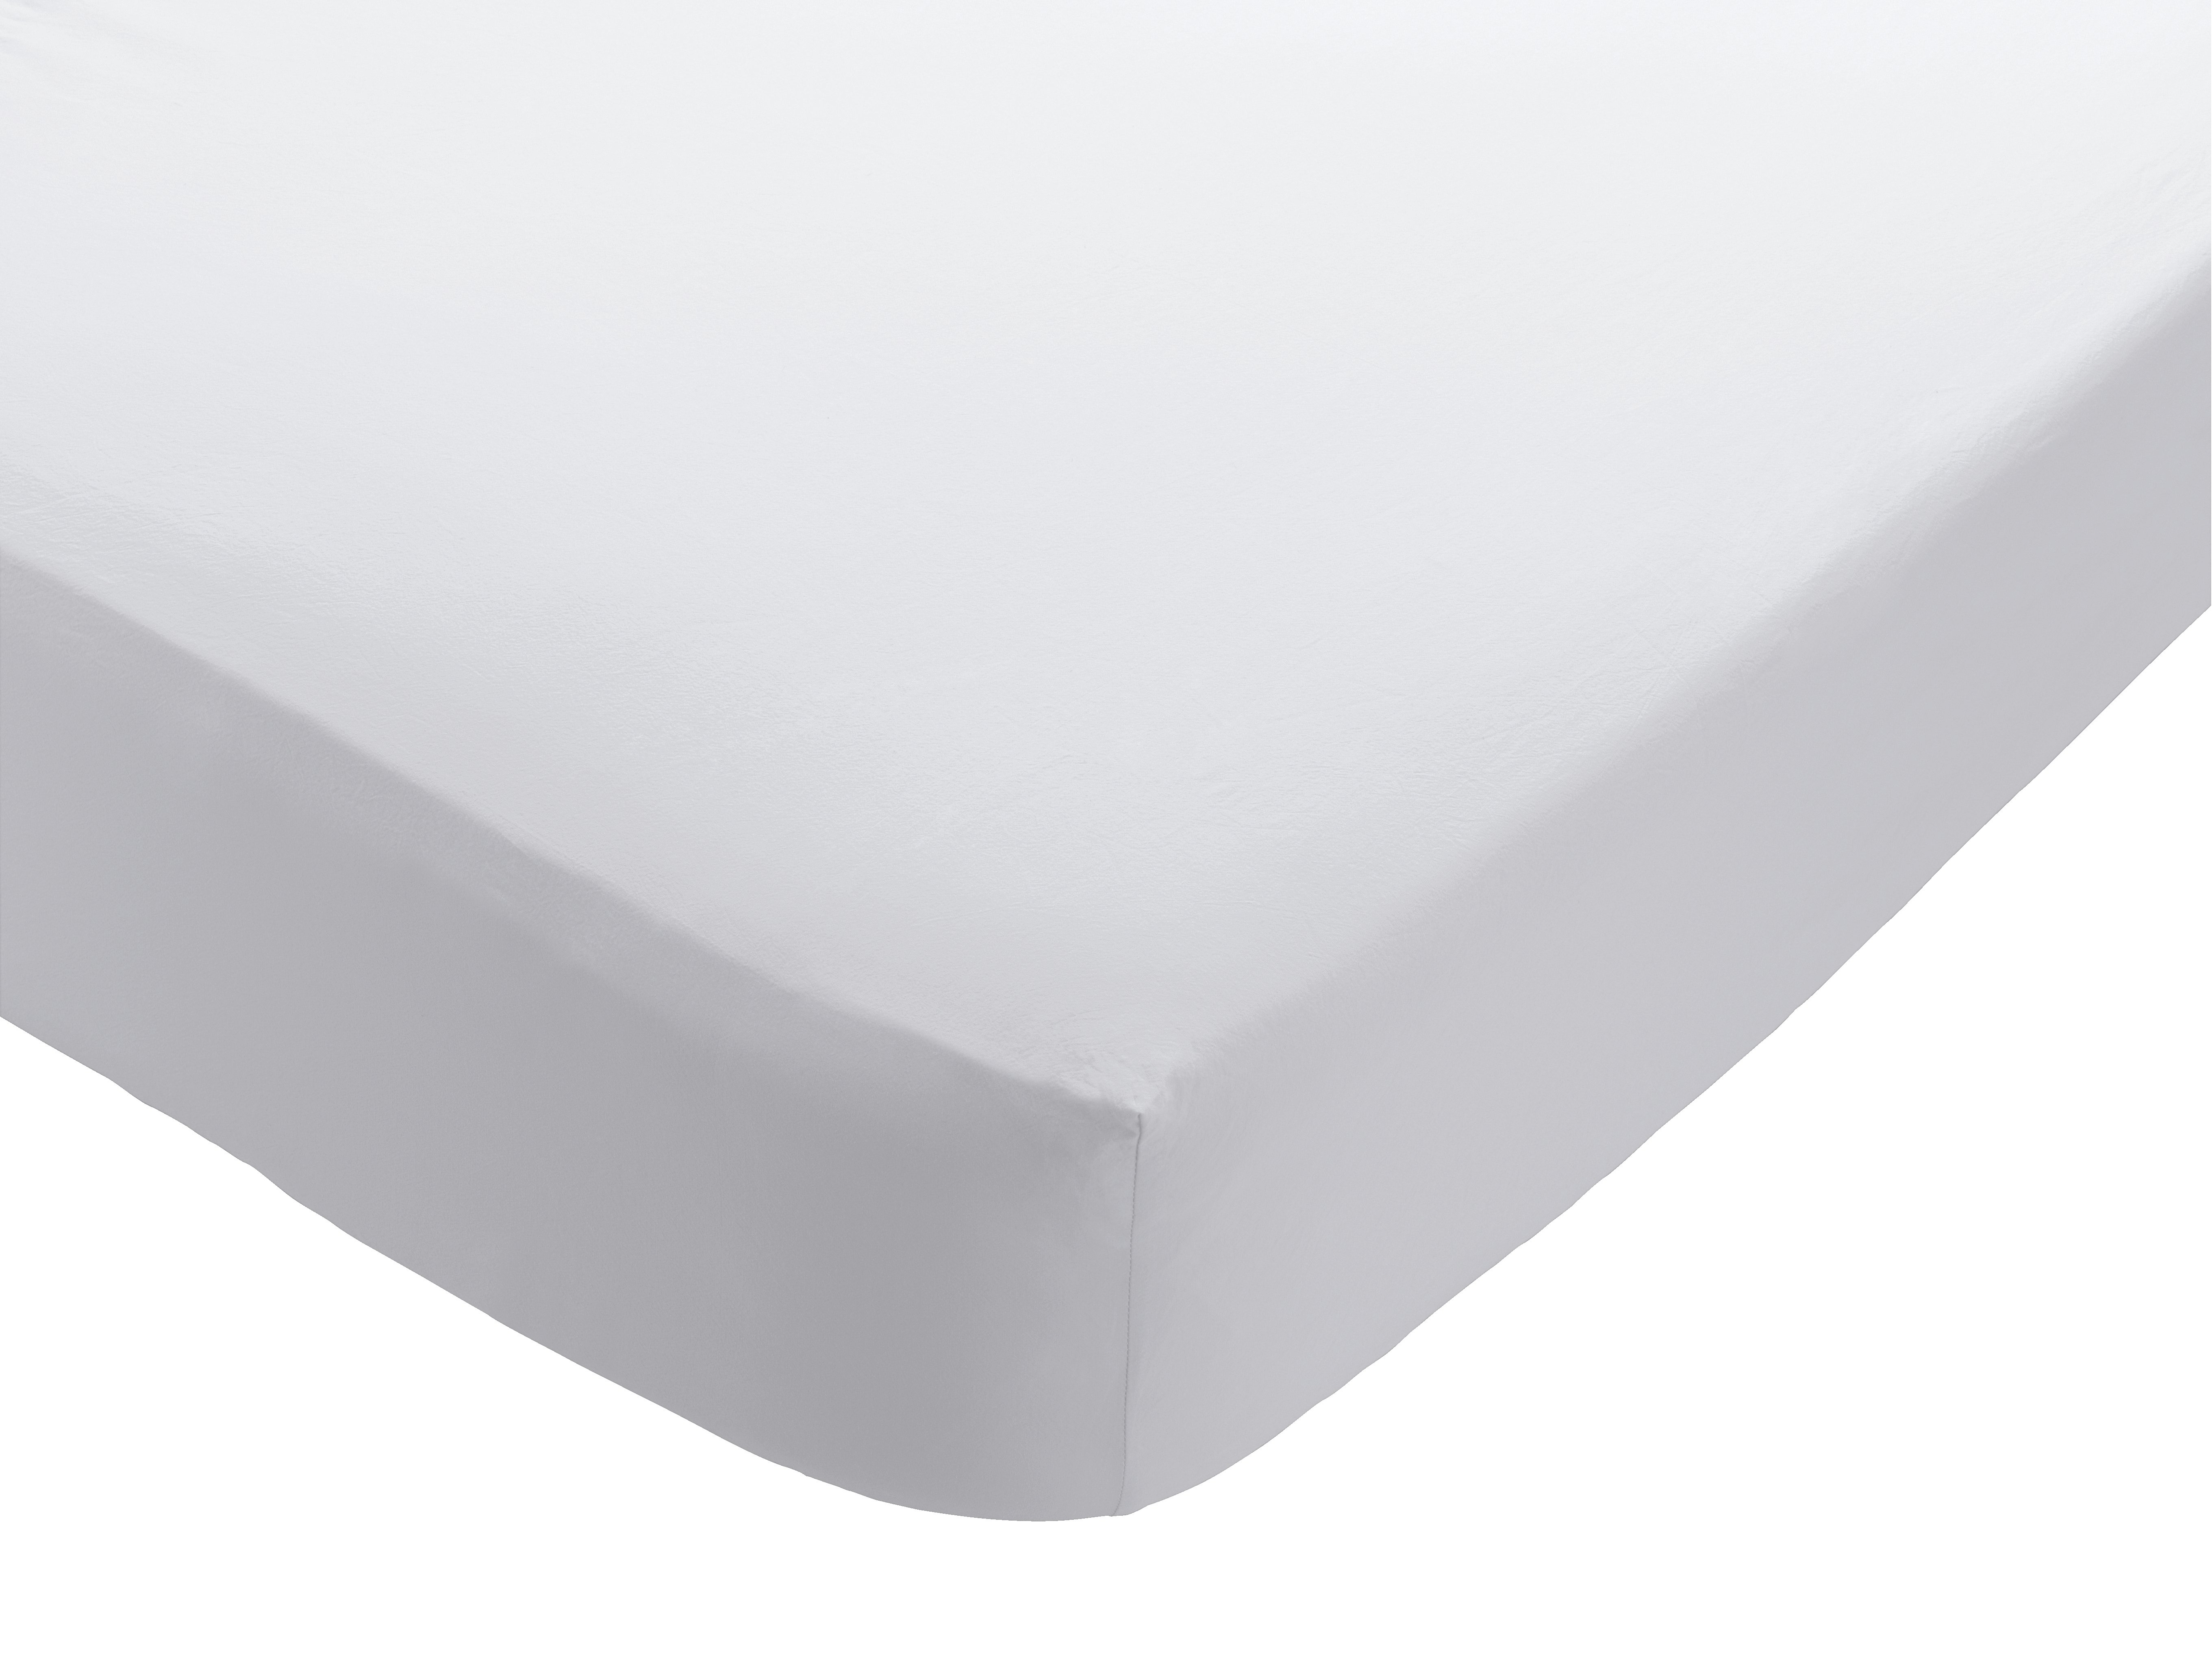 Habitat - Washed Double Fitted - Sheet - White